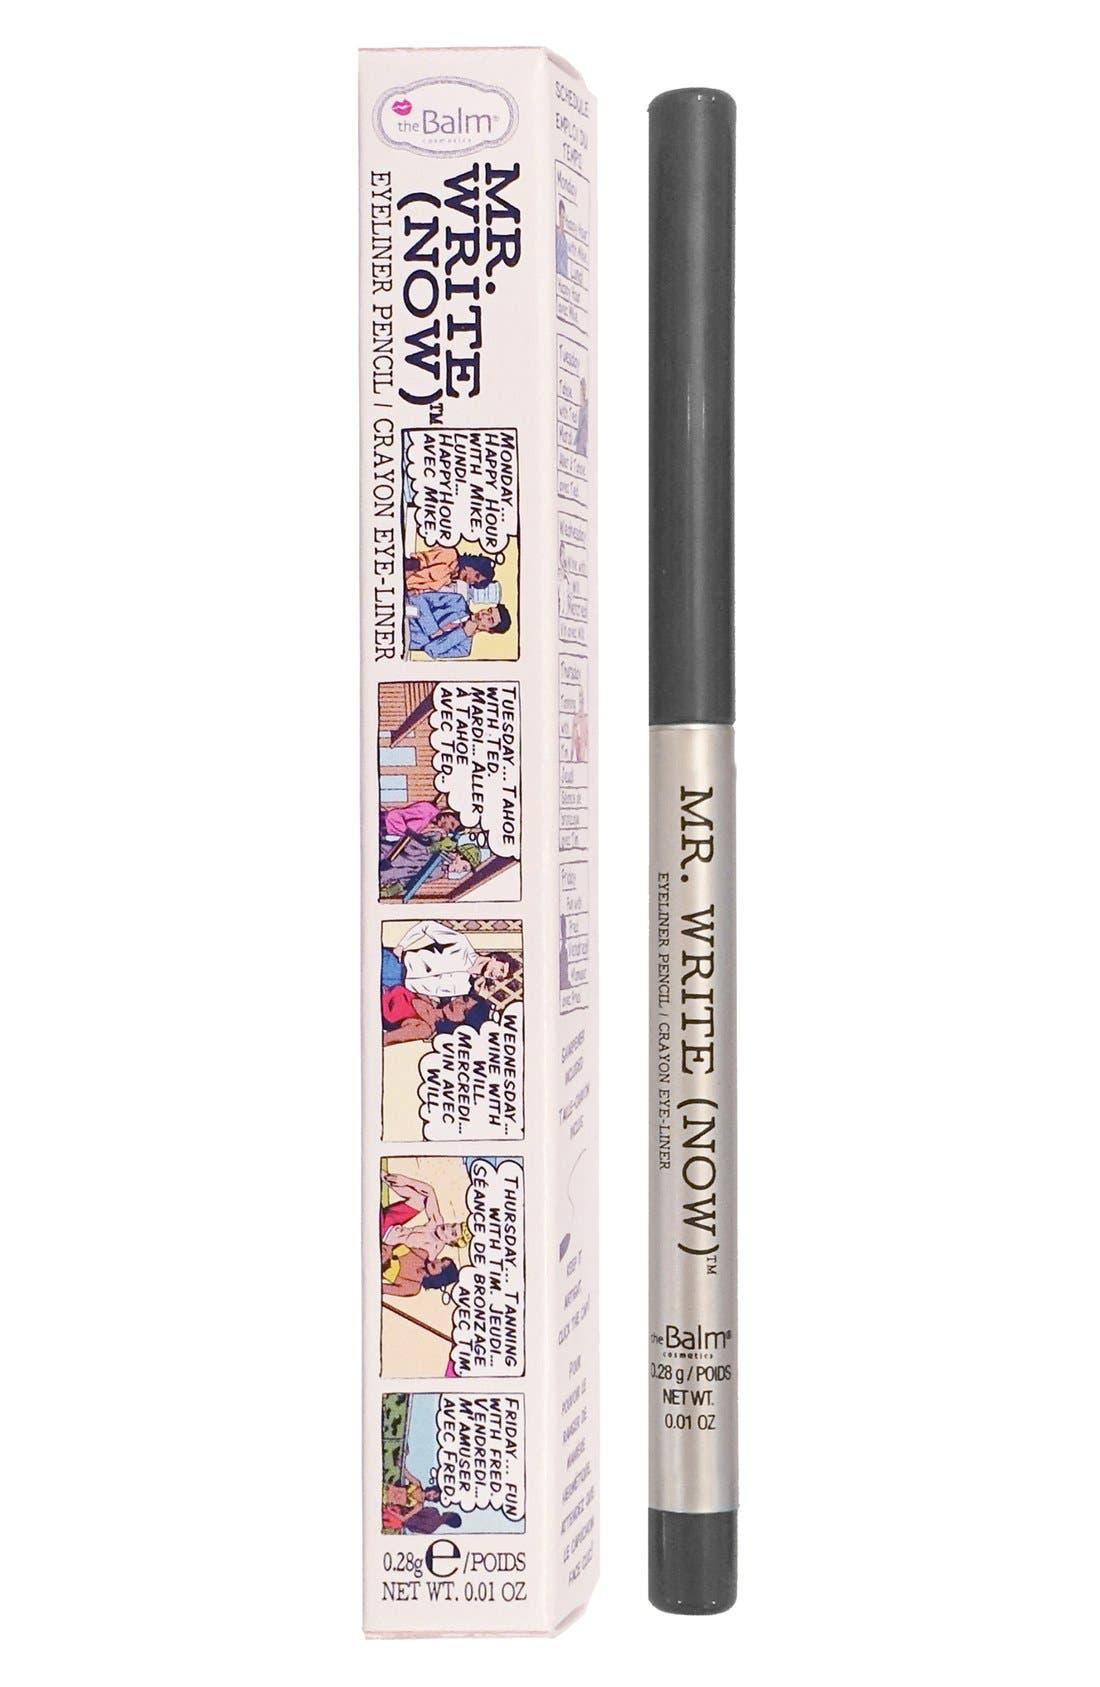 theBalm® 'Mr. Write Now' Eyeliner Pencil